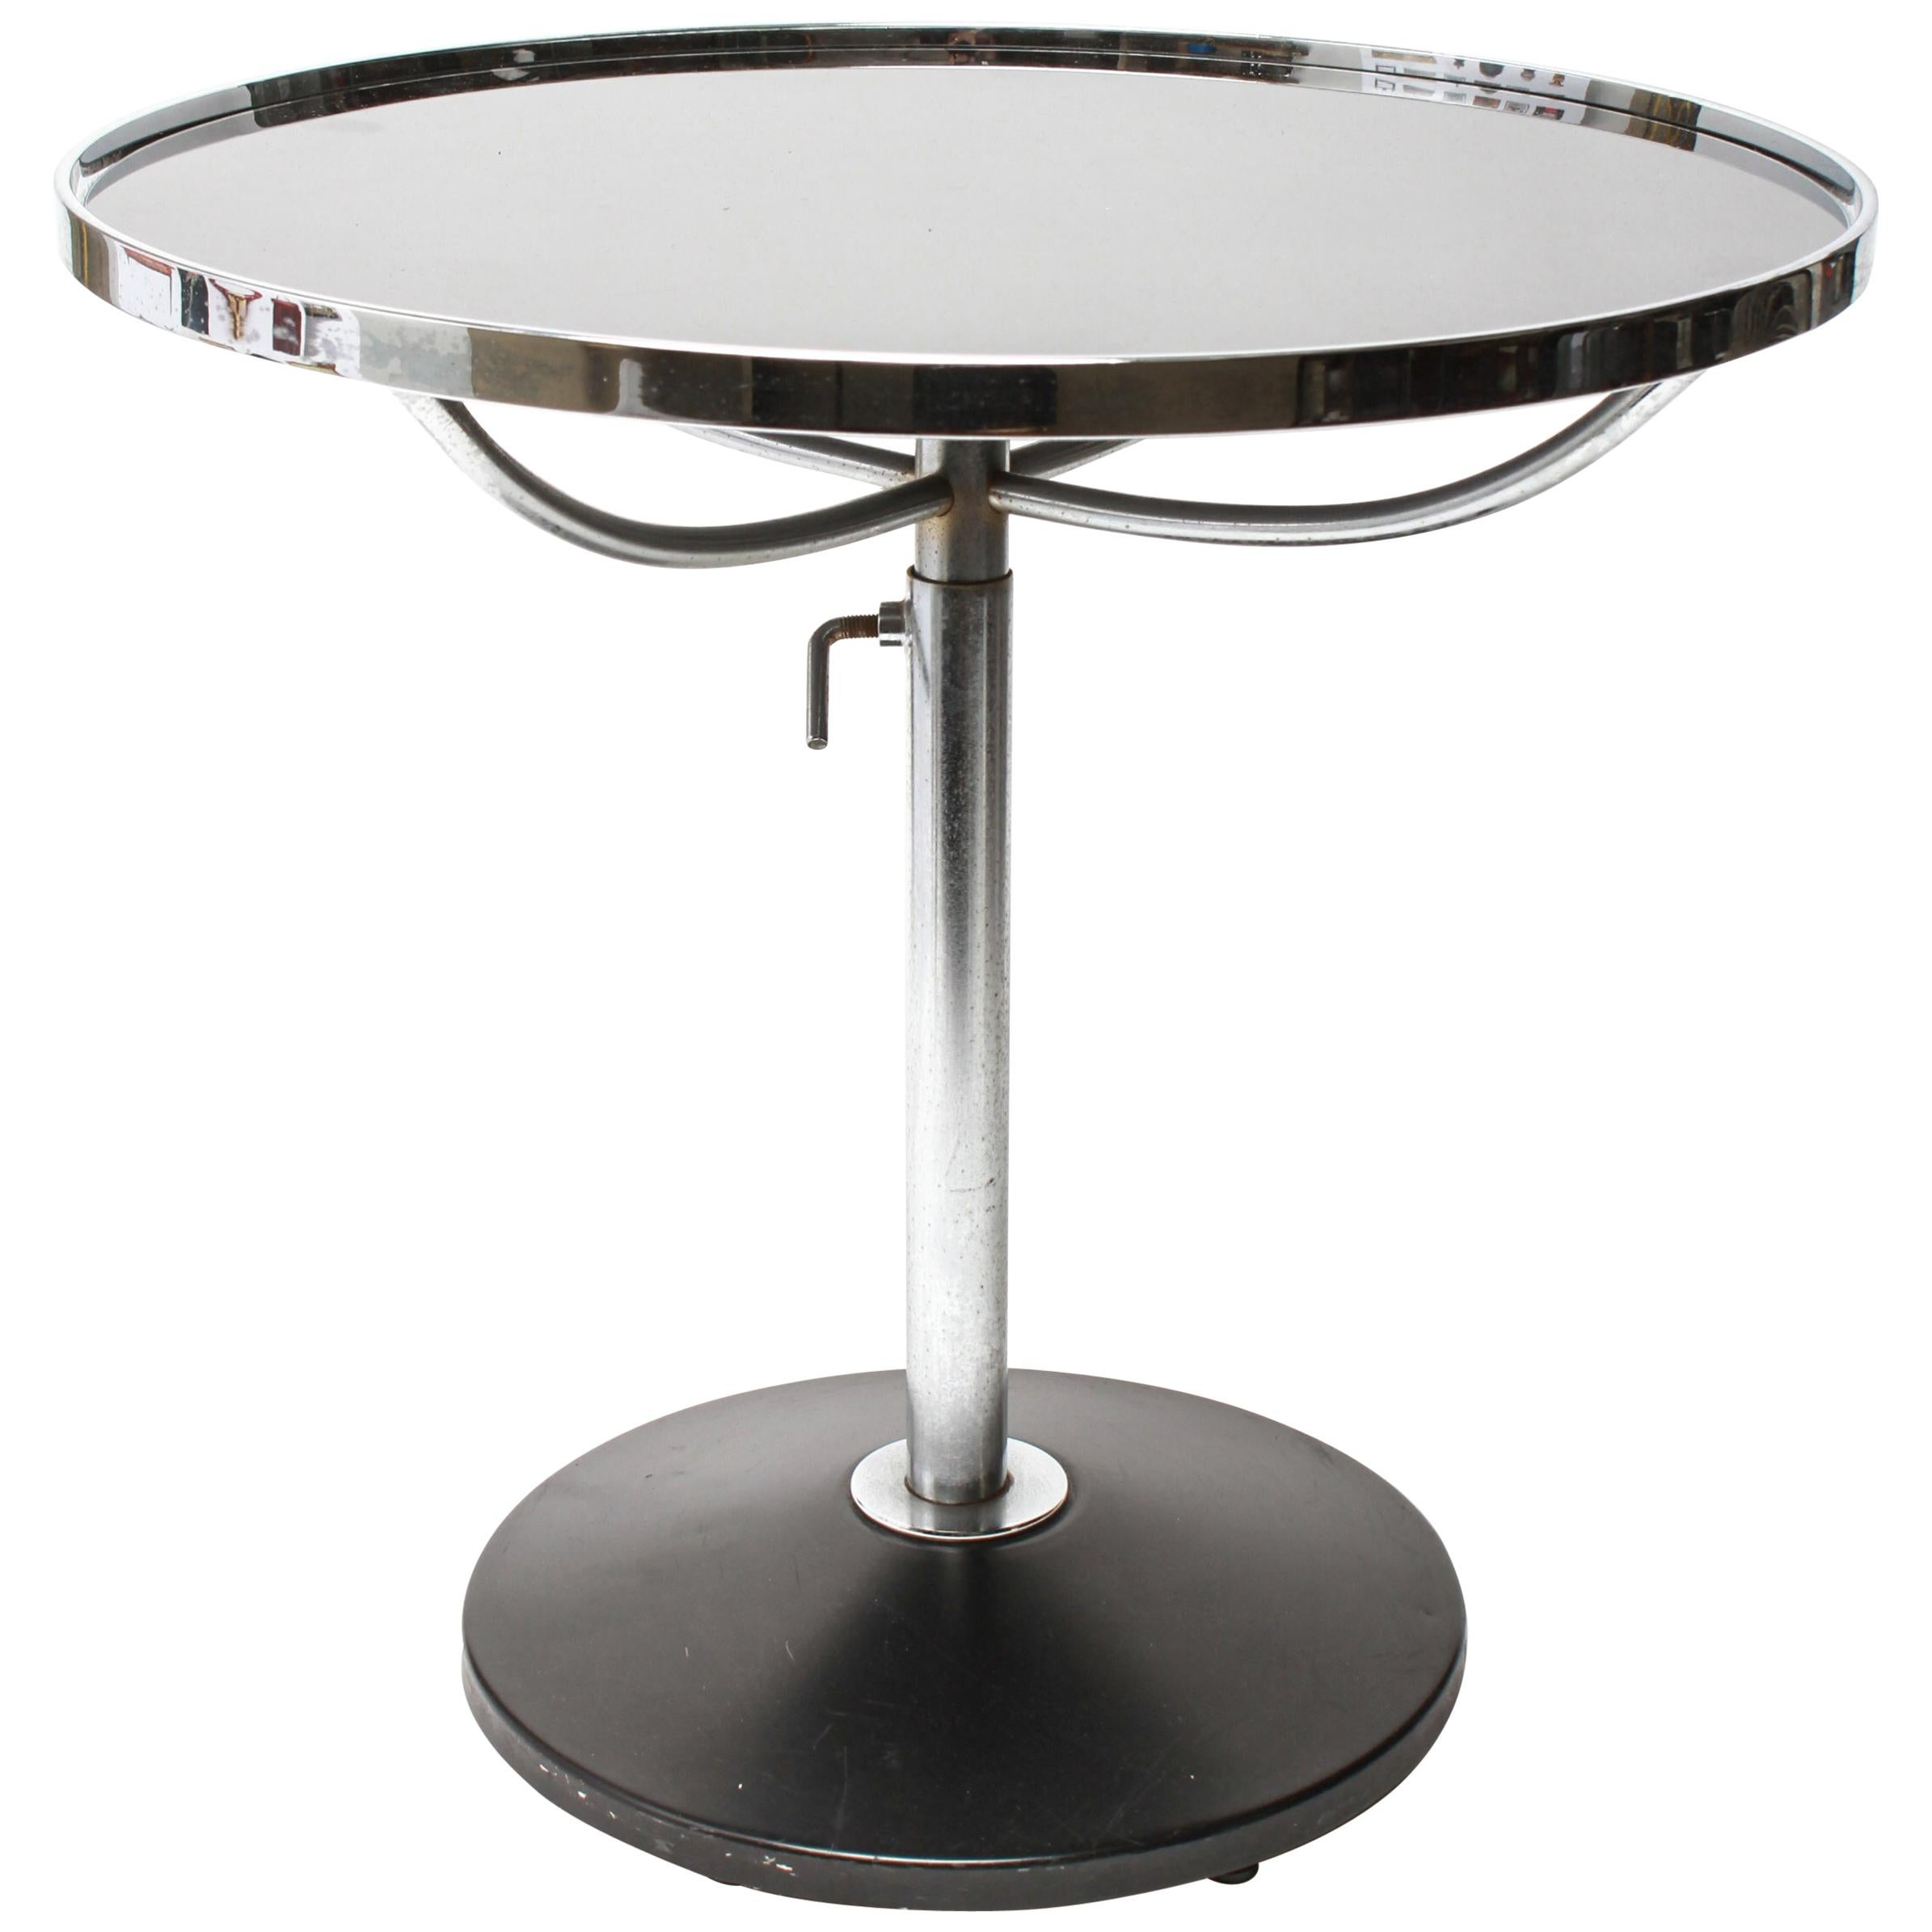 Modern Metal Circular Side Table With Adjustable Height At 1stdibs